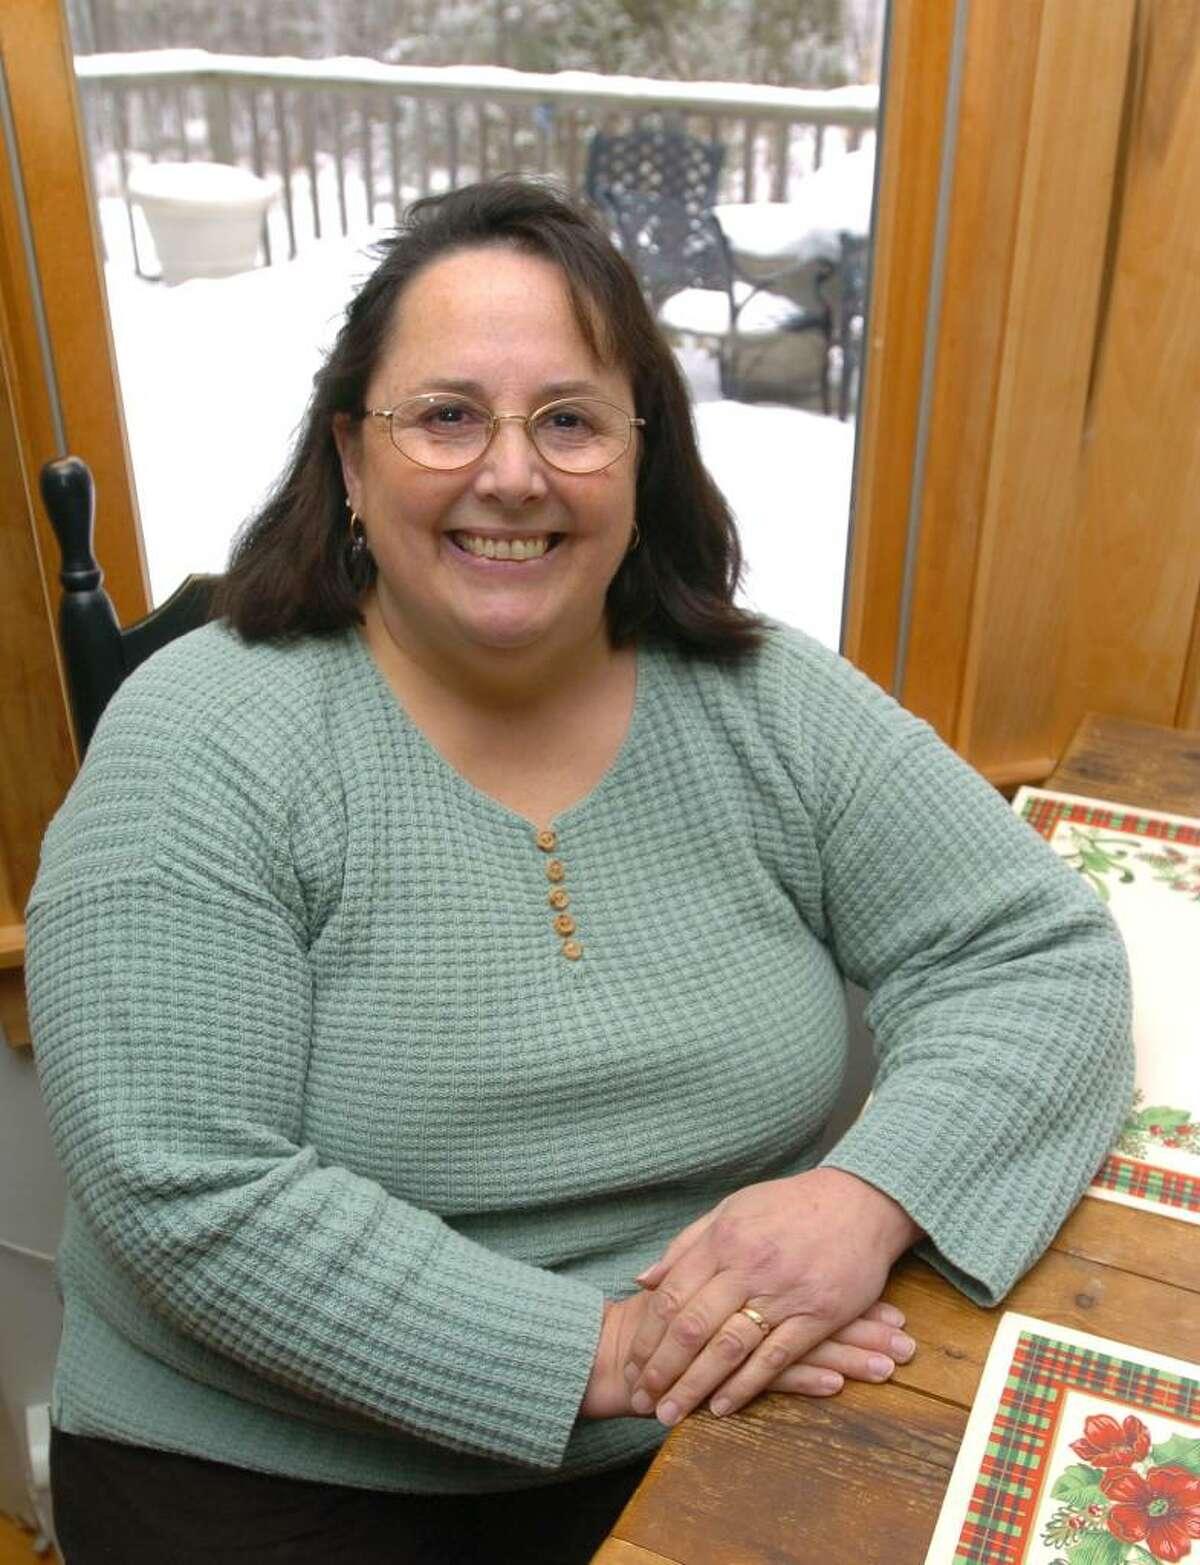 Susan Kokoska, of Newtown Friday, Jan. 8, 2010.